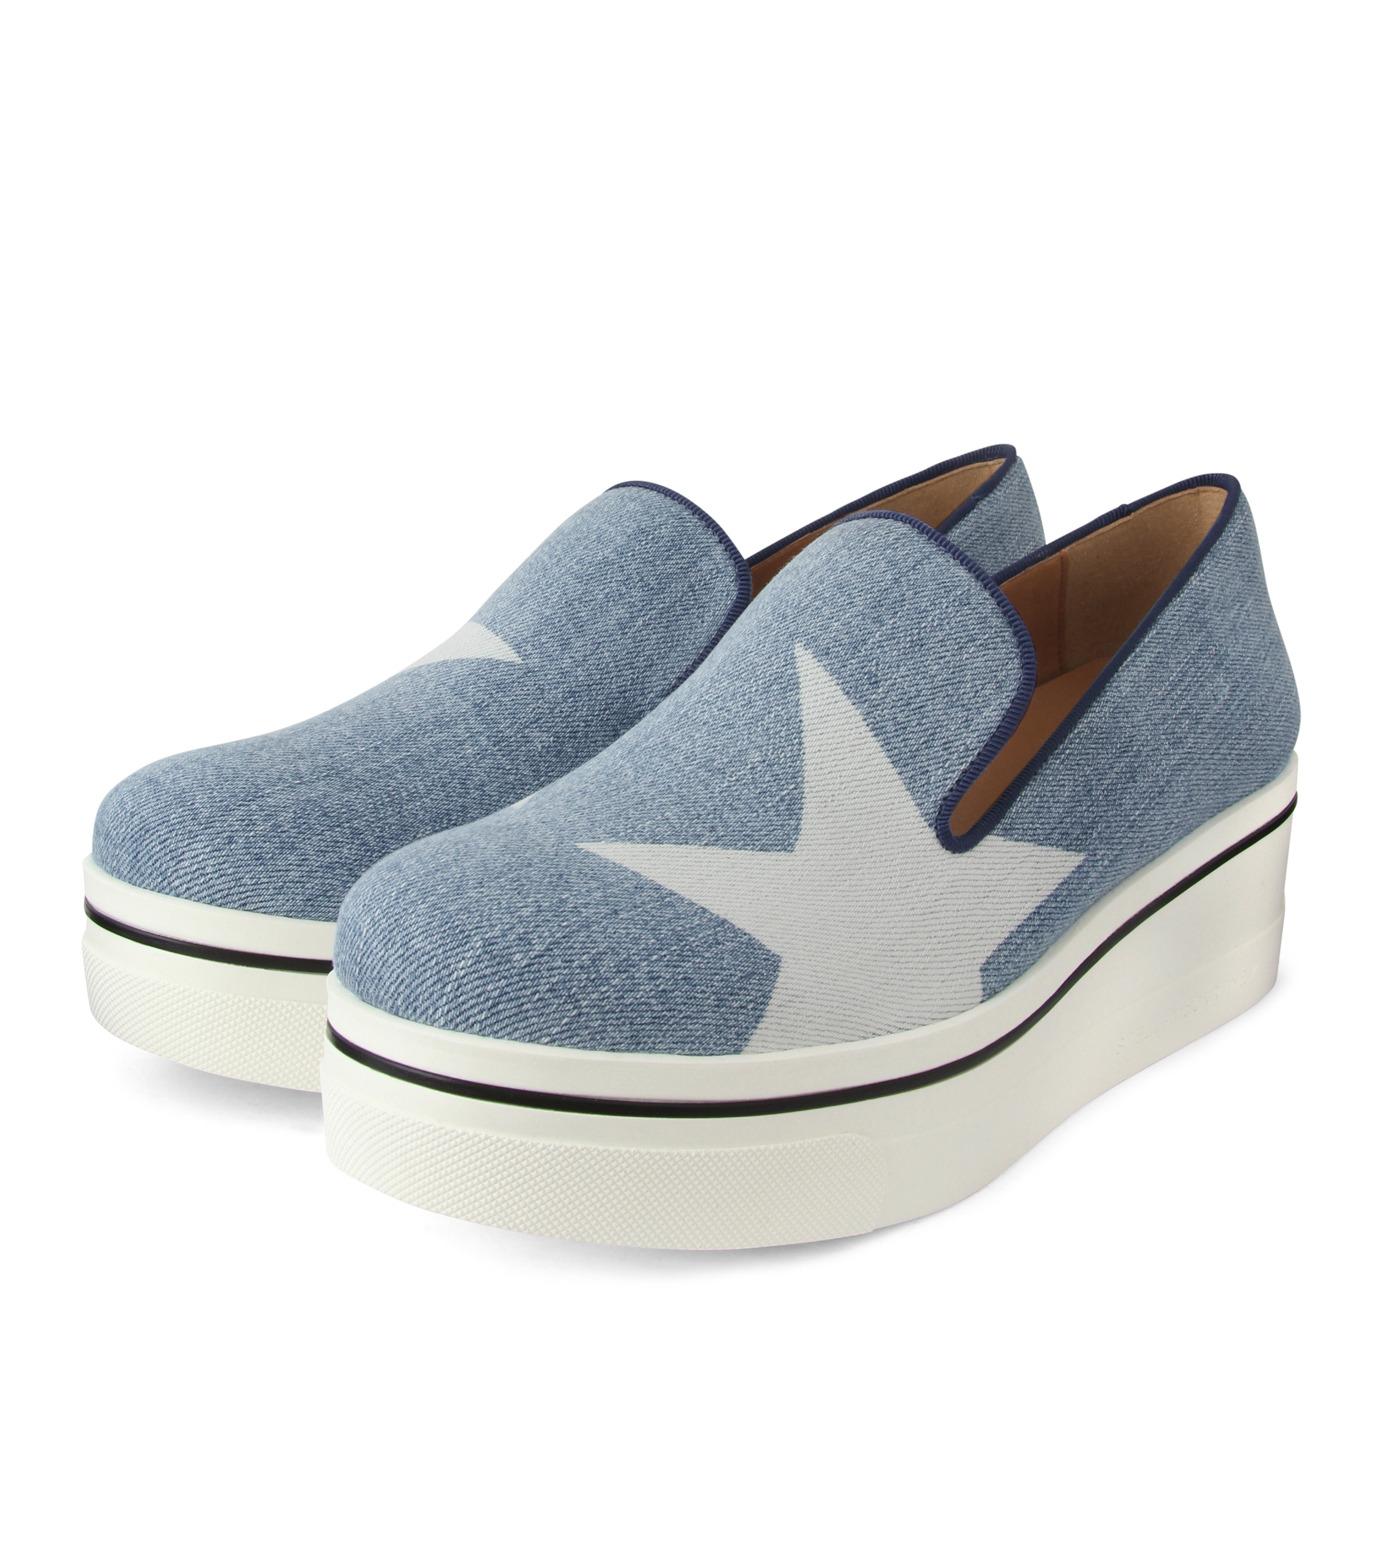 Stella McCartney(ステラマッカートニー)のBinx Star-INDIGO(スニーカー/sneaker)-392333-W02Y1-94 拡大詳細画像3